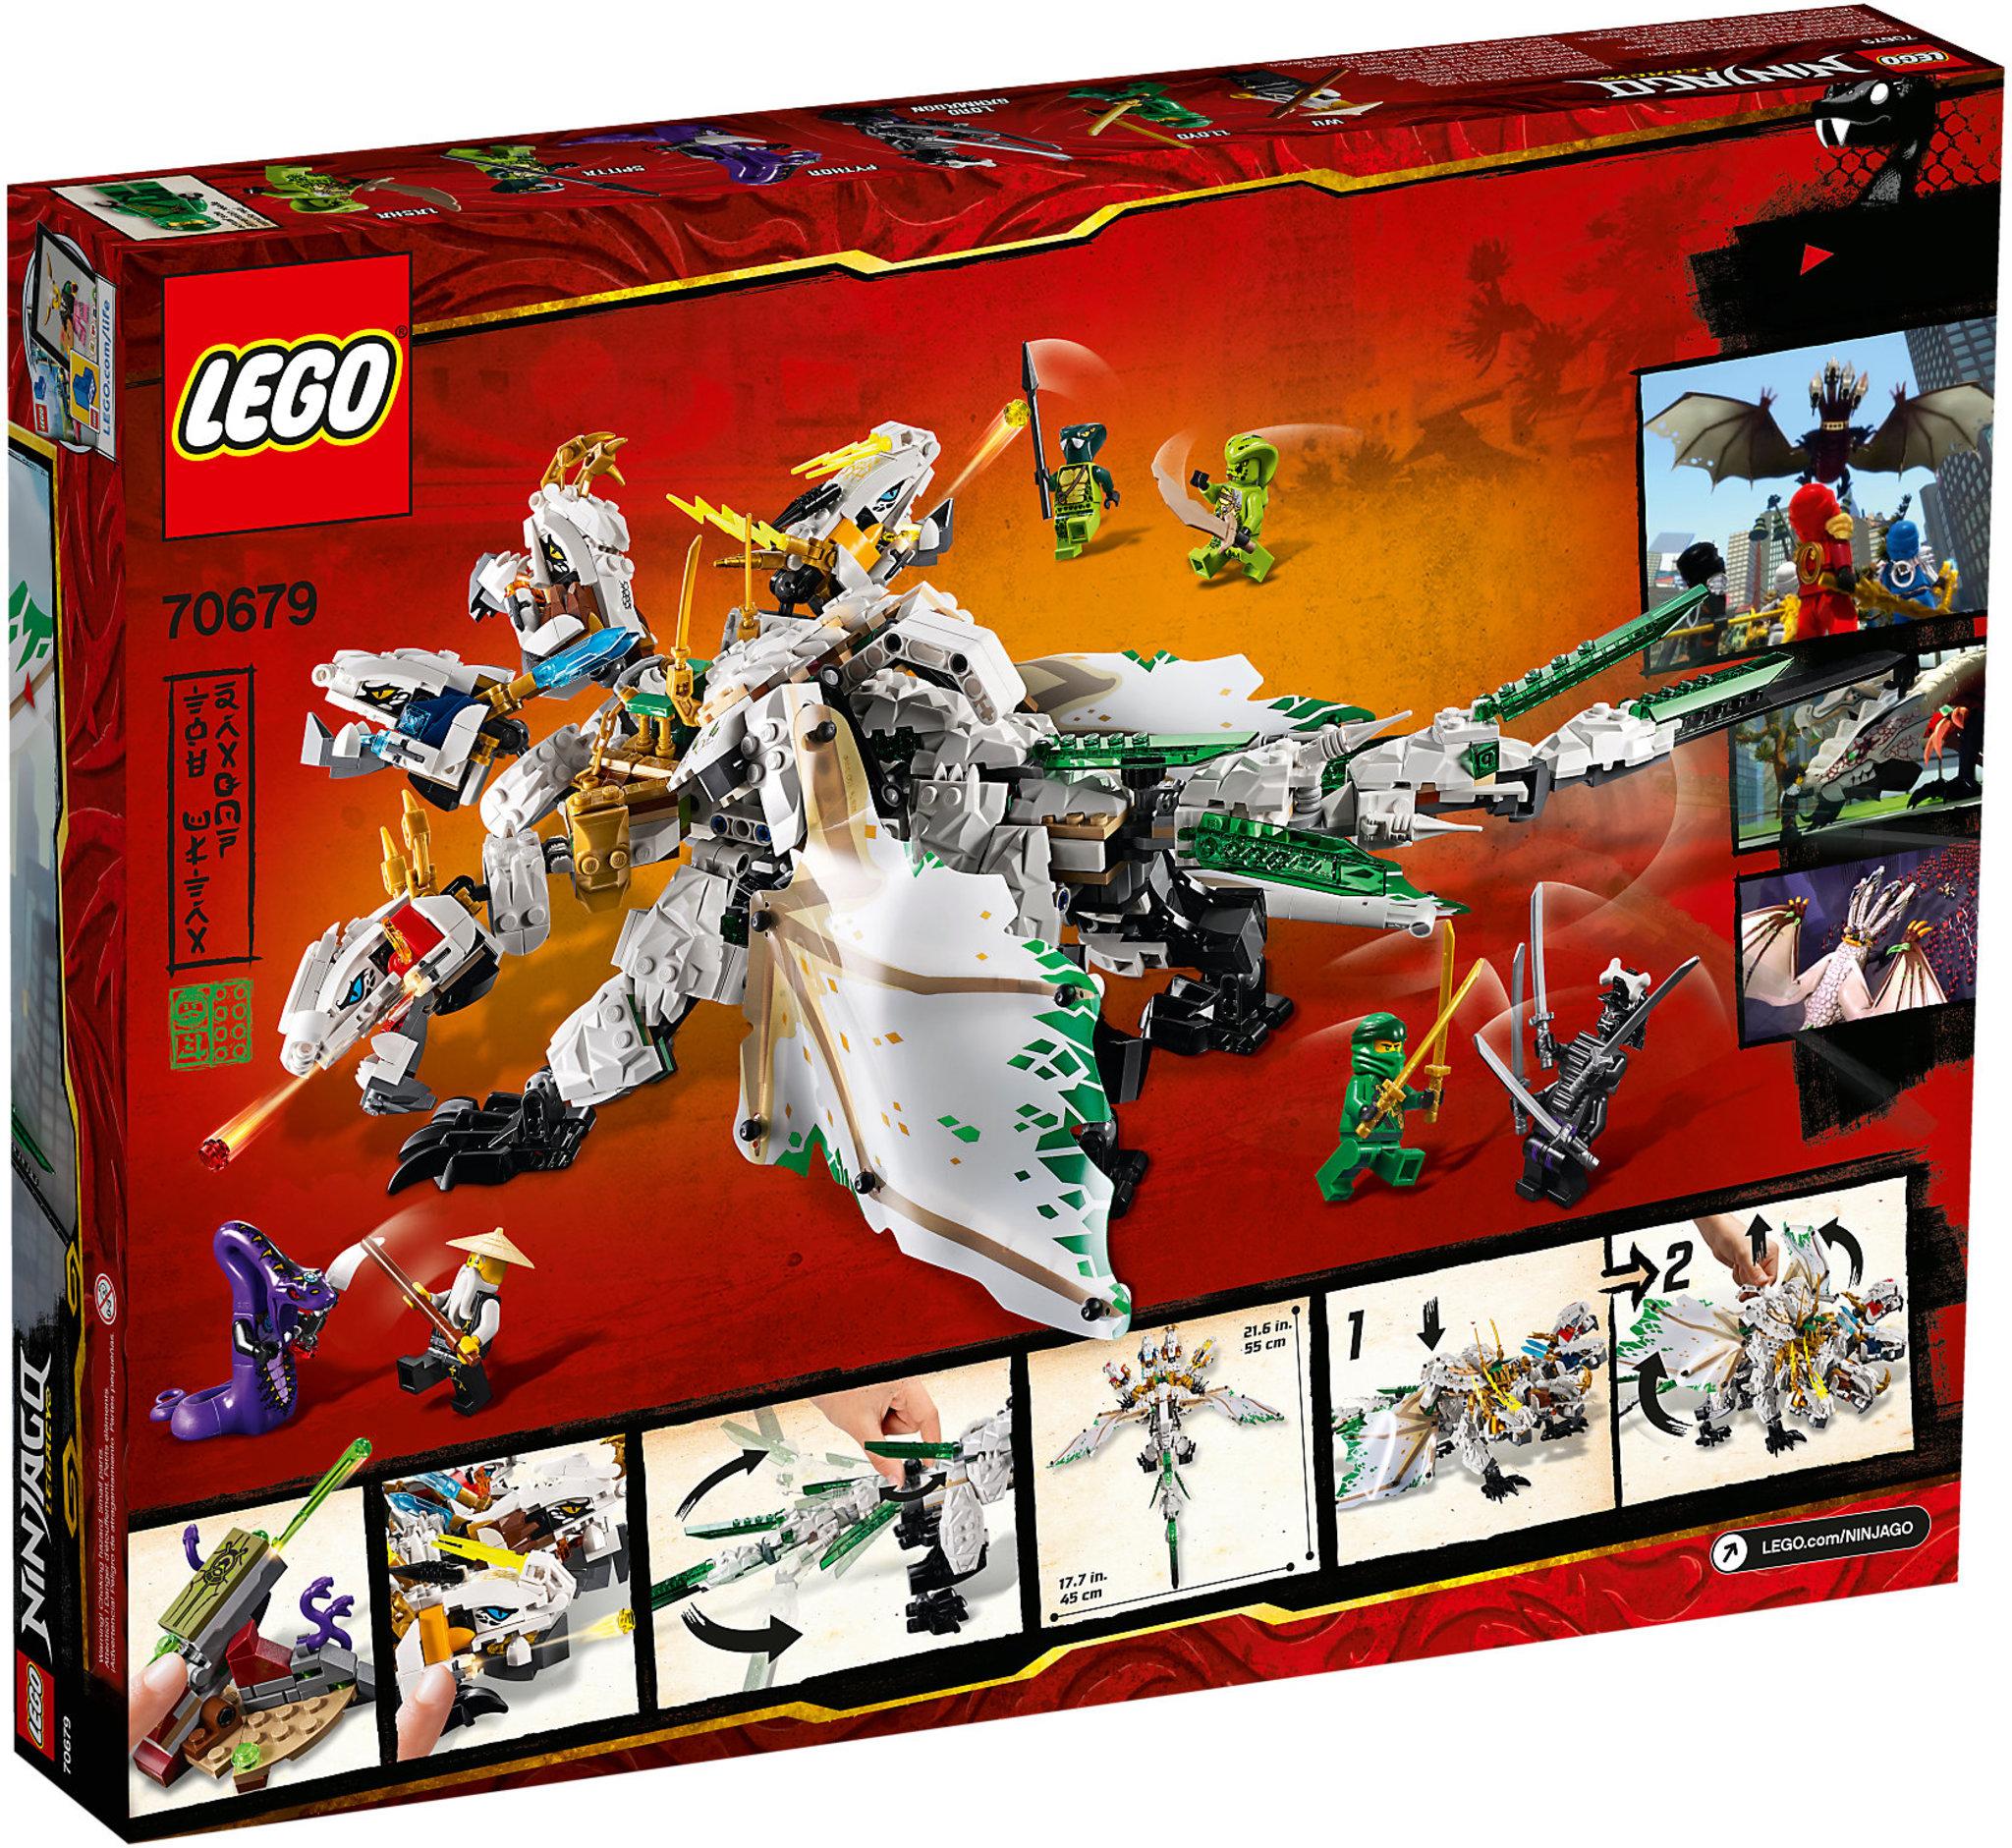 LEGO Ninjago 70679 - The Ultra Dragon | Mattonito